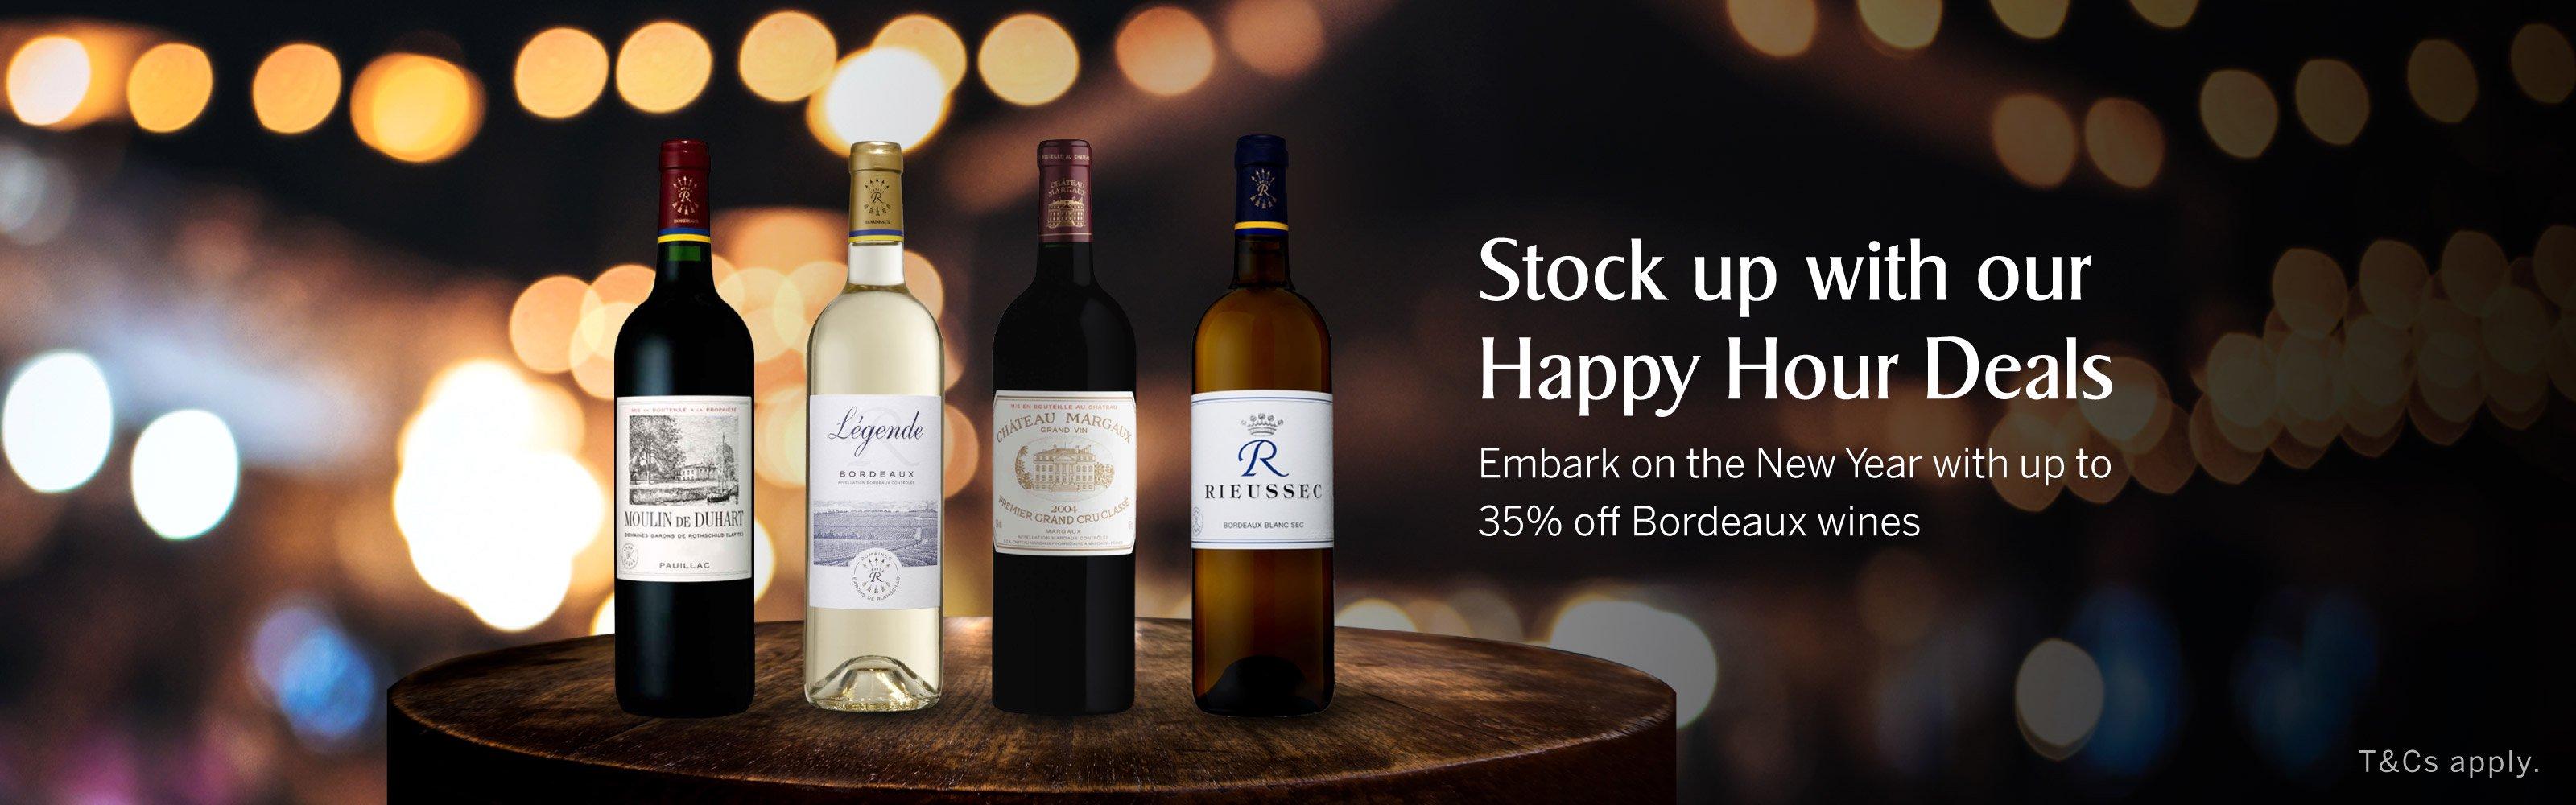 January 2021 - Liquor Deals - Up to 35% off Bordeaux wines